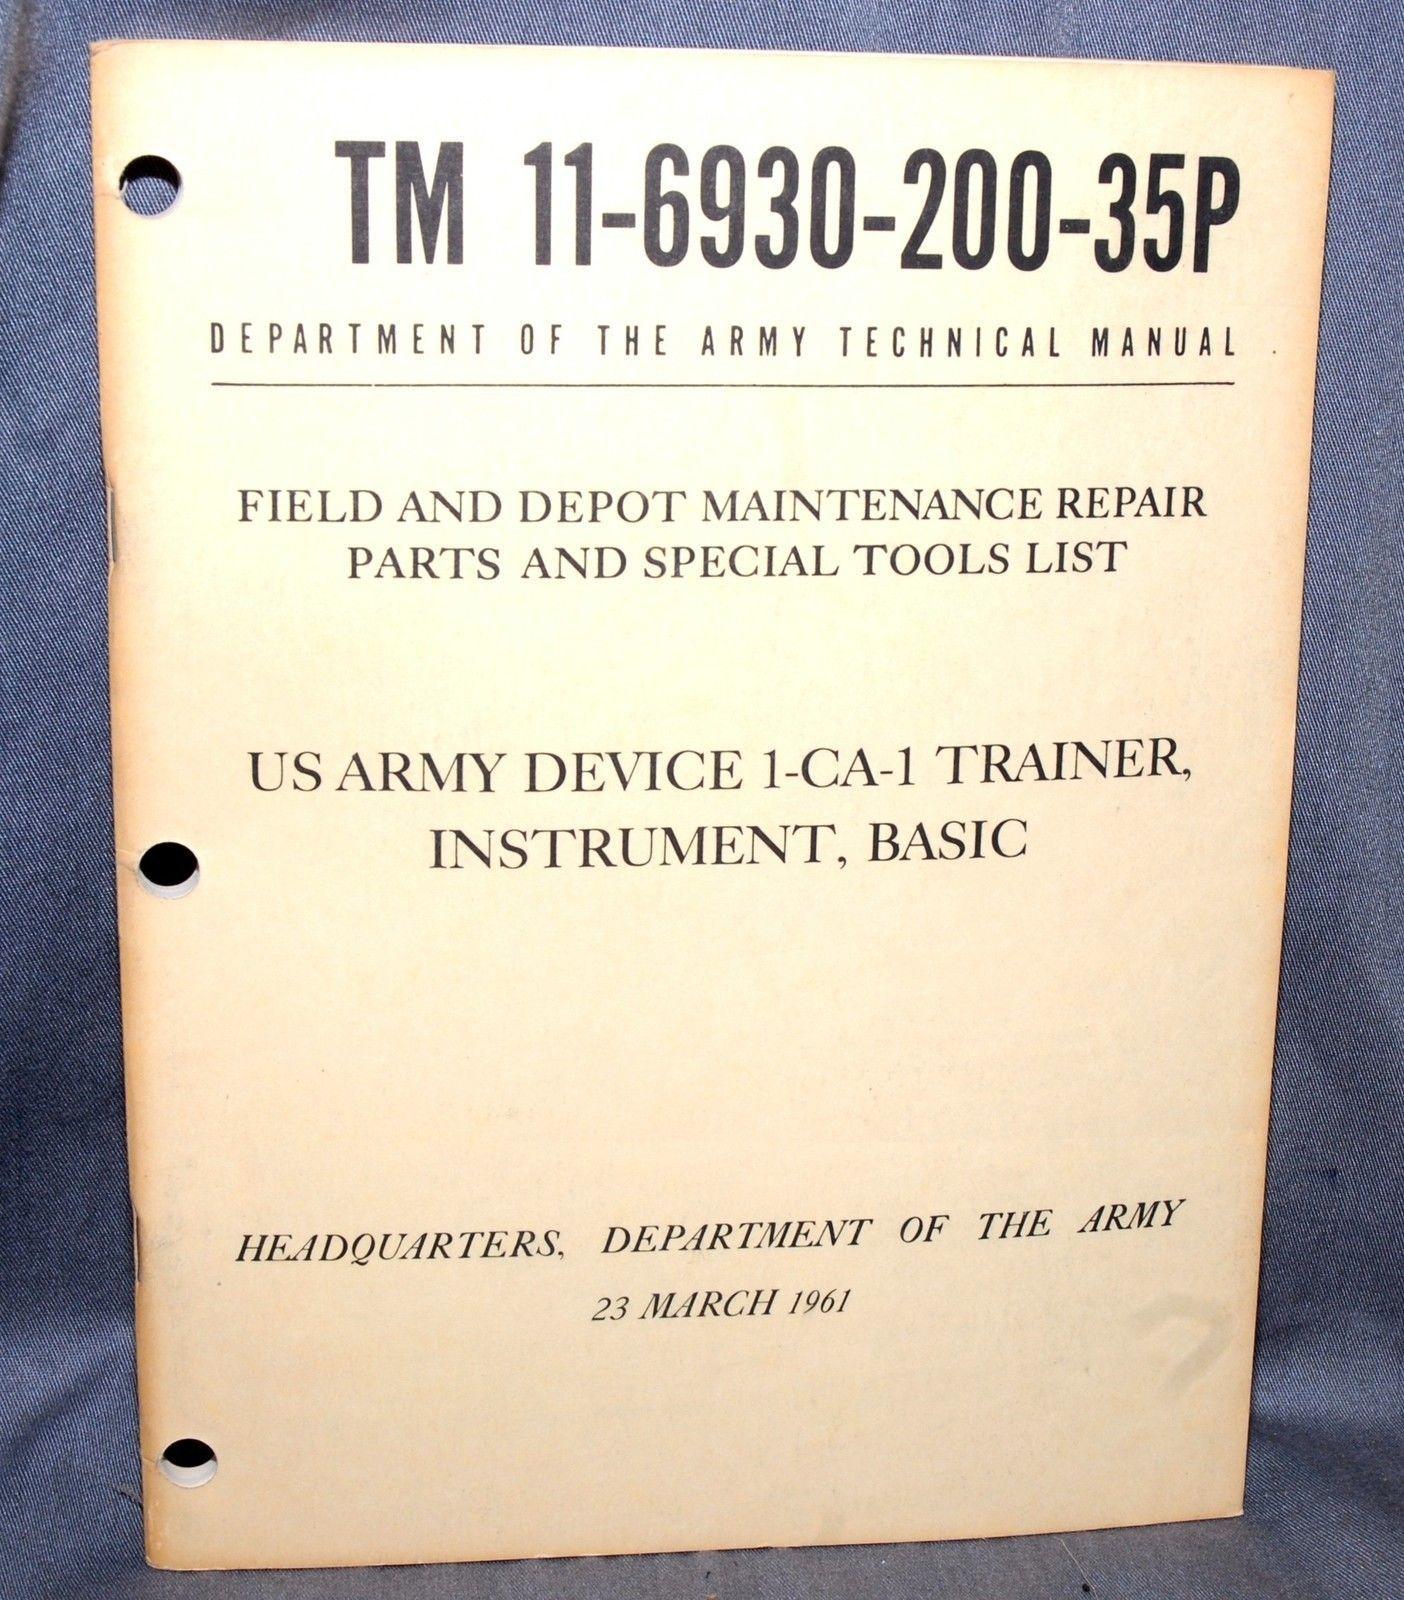 3 RARE LINK TRAINER SIMULAT. FLT. MANUALS:  OPERATOR, ORG. MAINT & DEPOT REPAIR